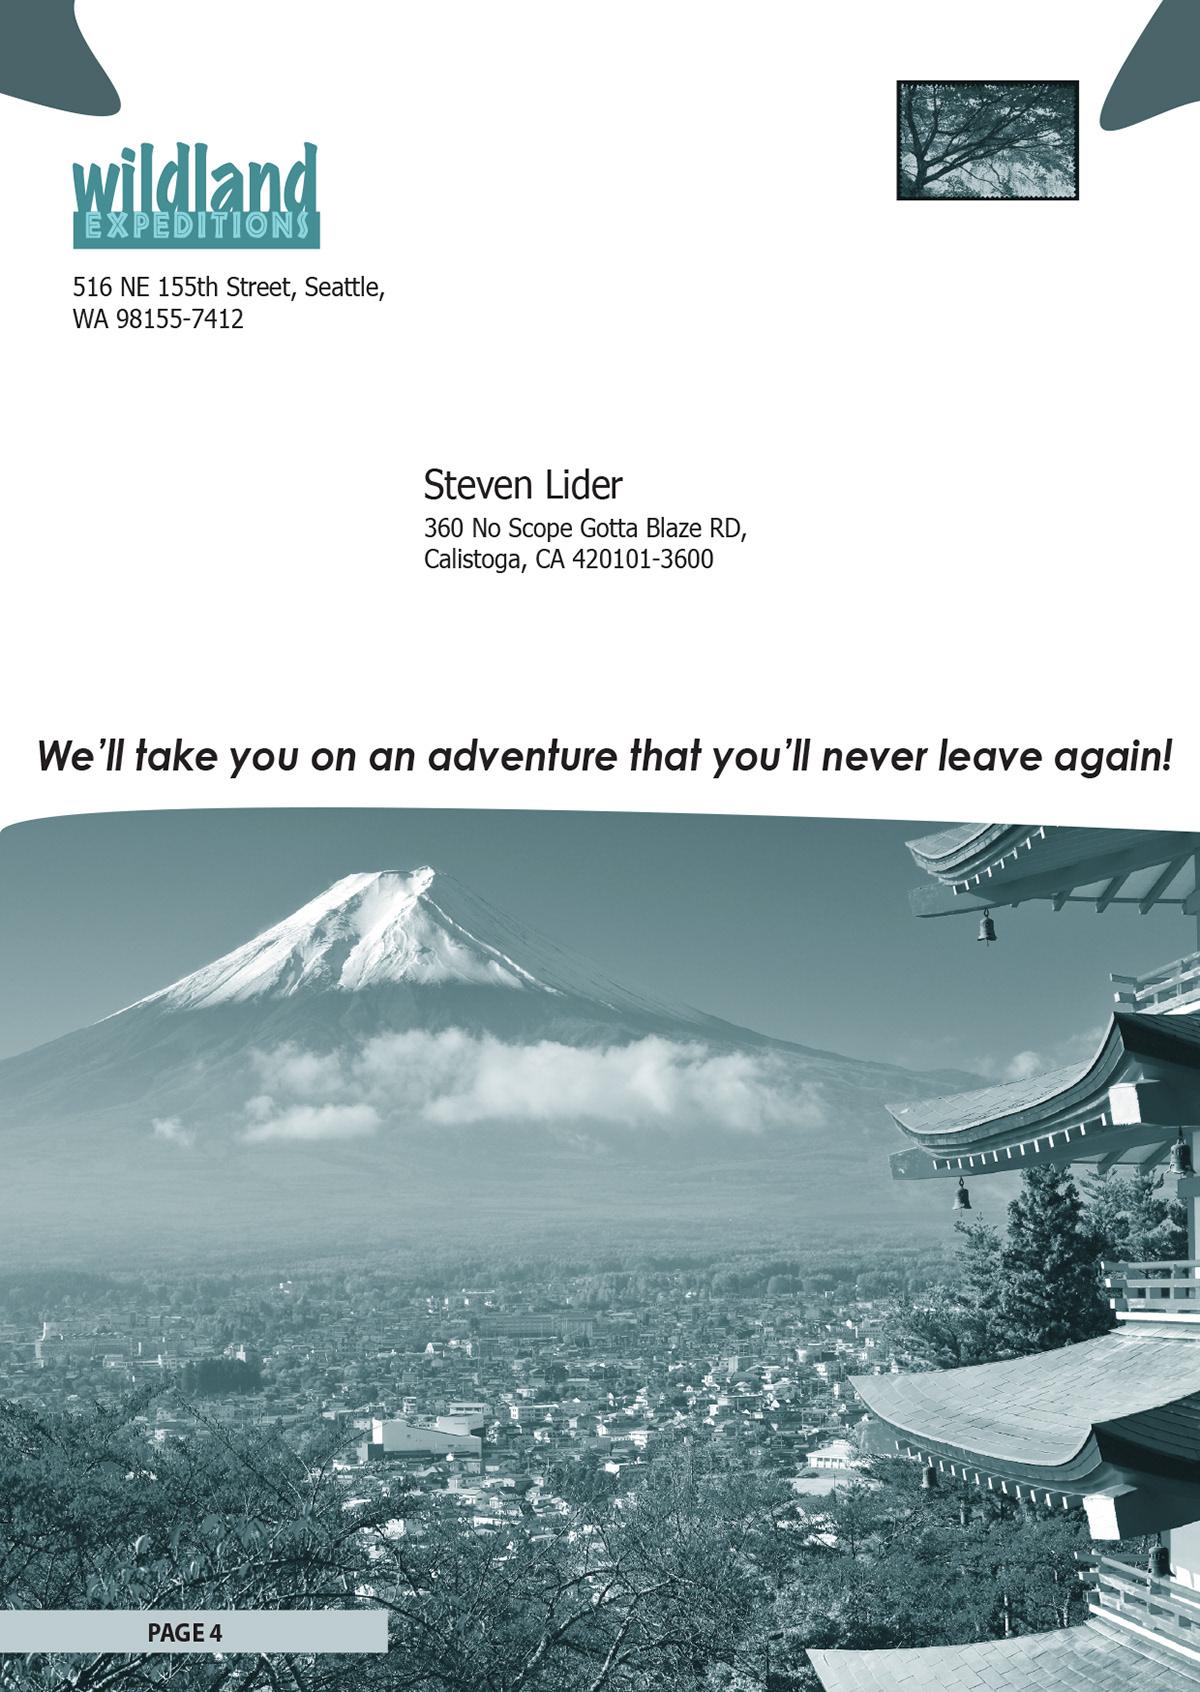 Japan Travel Brochure Project on Behance